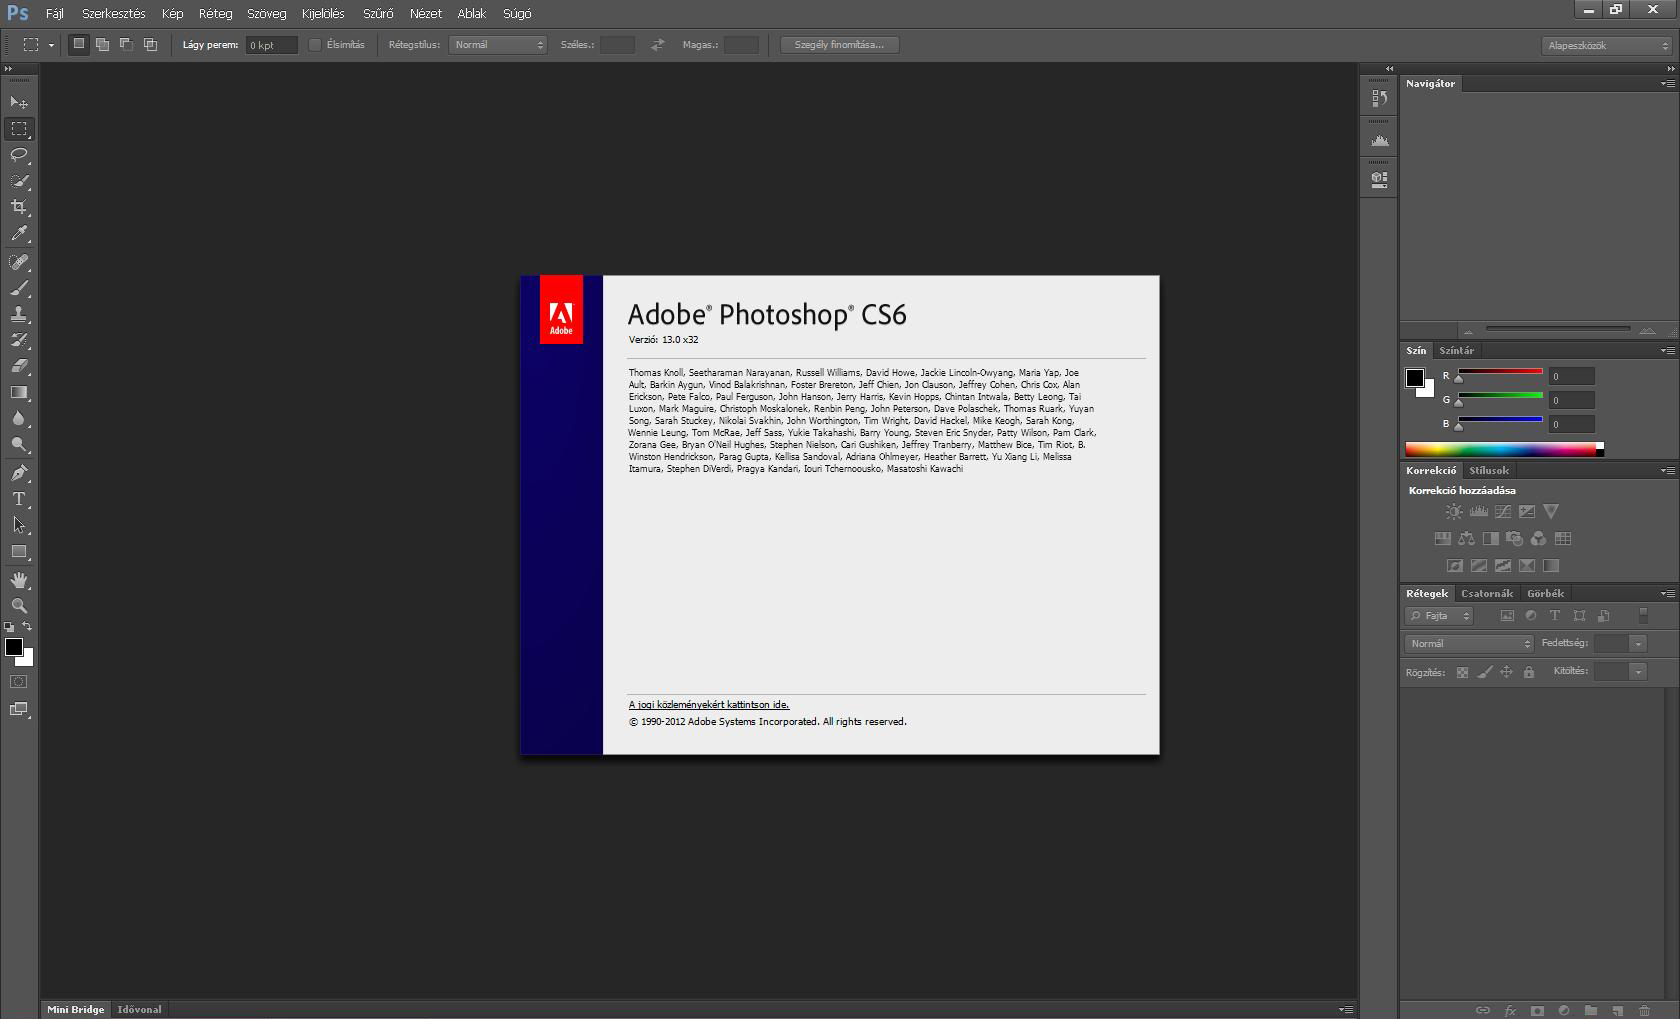 adobe-photoshop-cs6-02.JPG